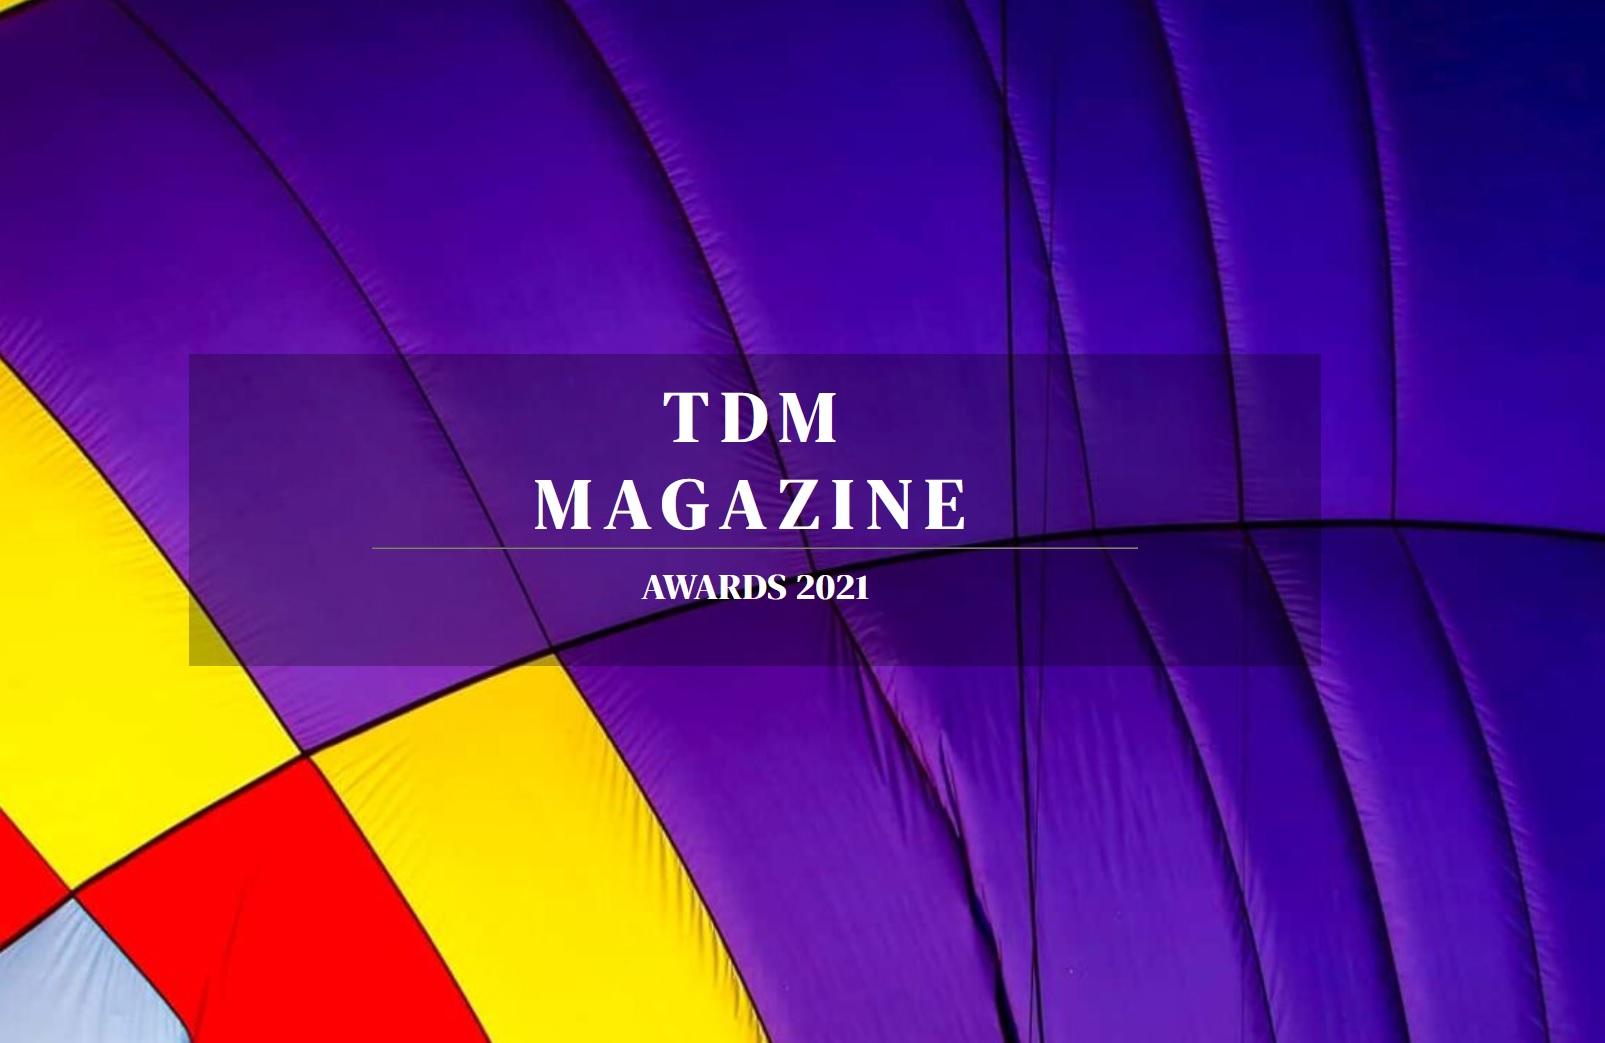 TDM Awards 2021 - logo